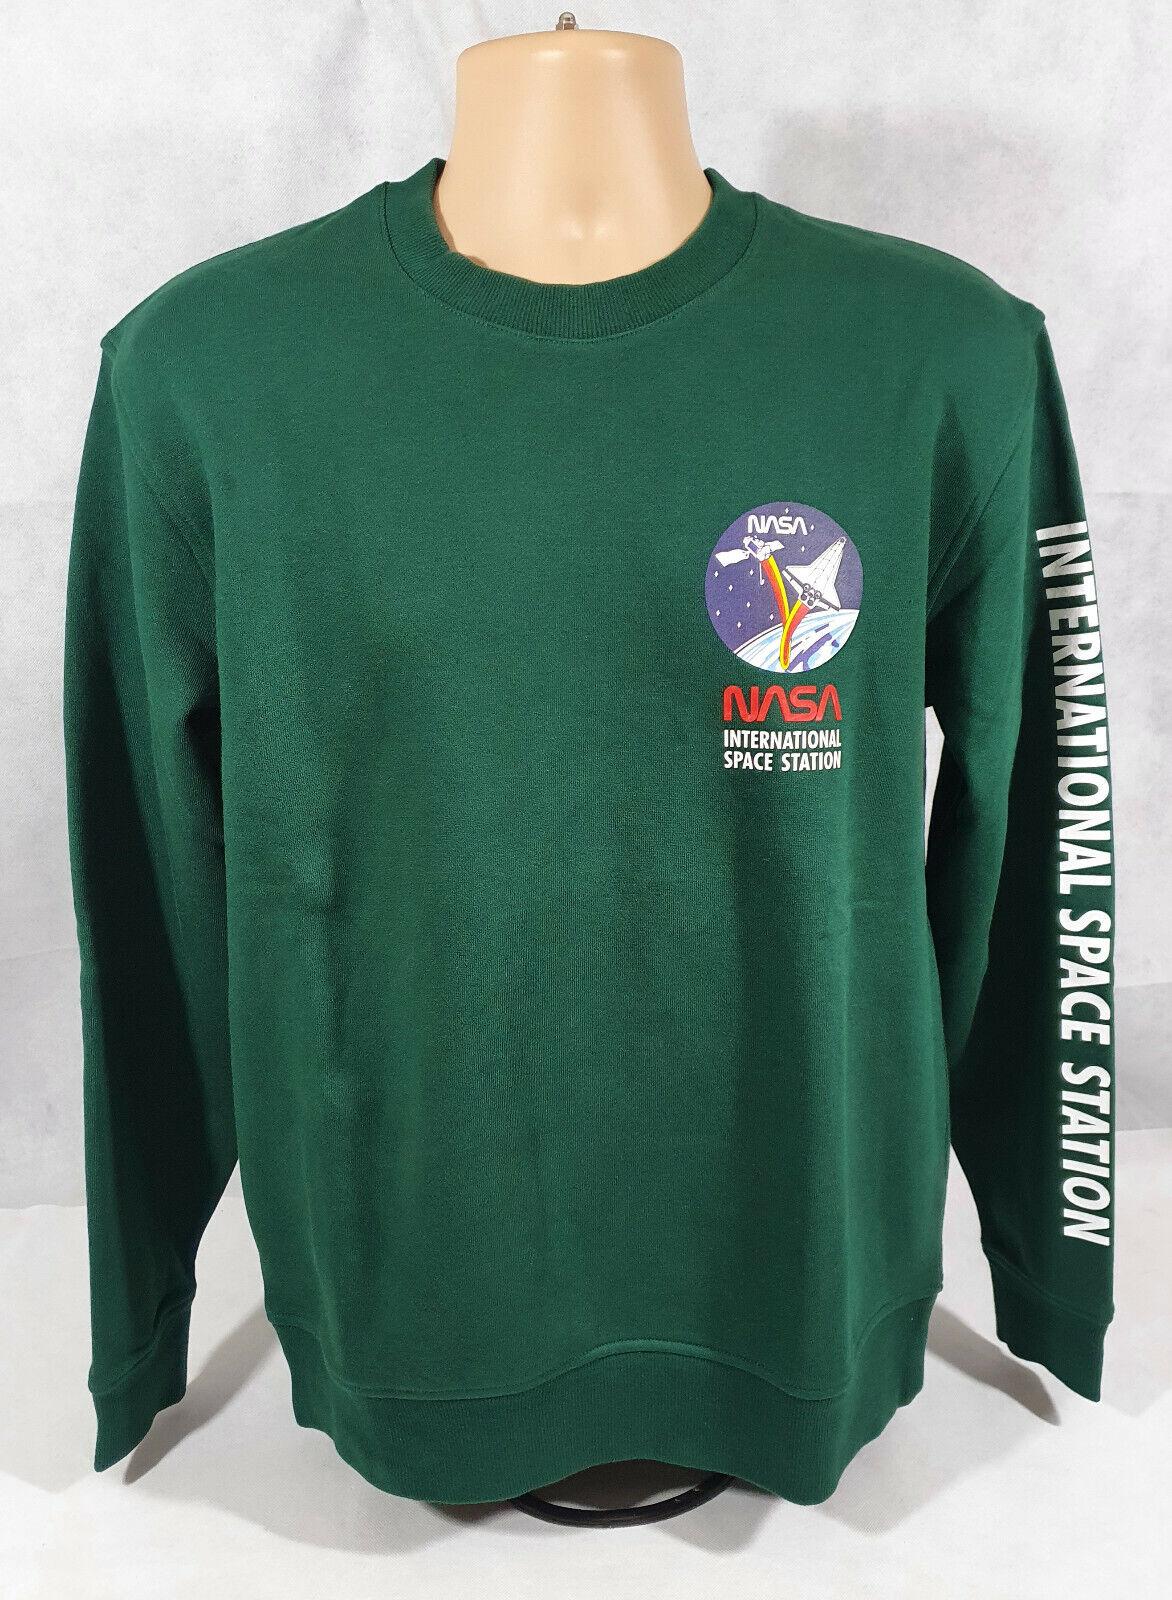 NASA International Space Station, Green, Sweatshirt/Jumper, BNWT, NEW